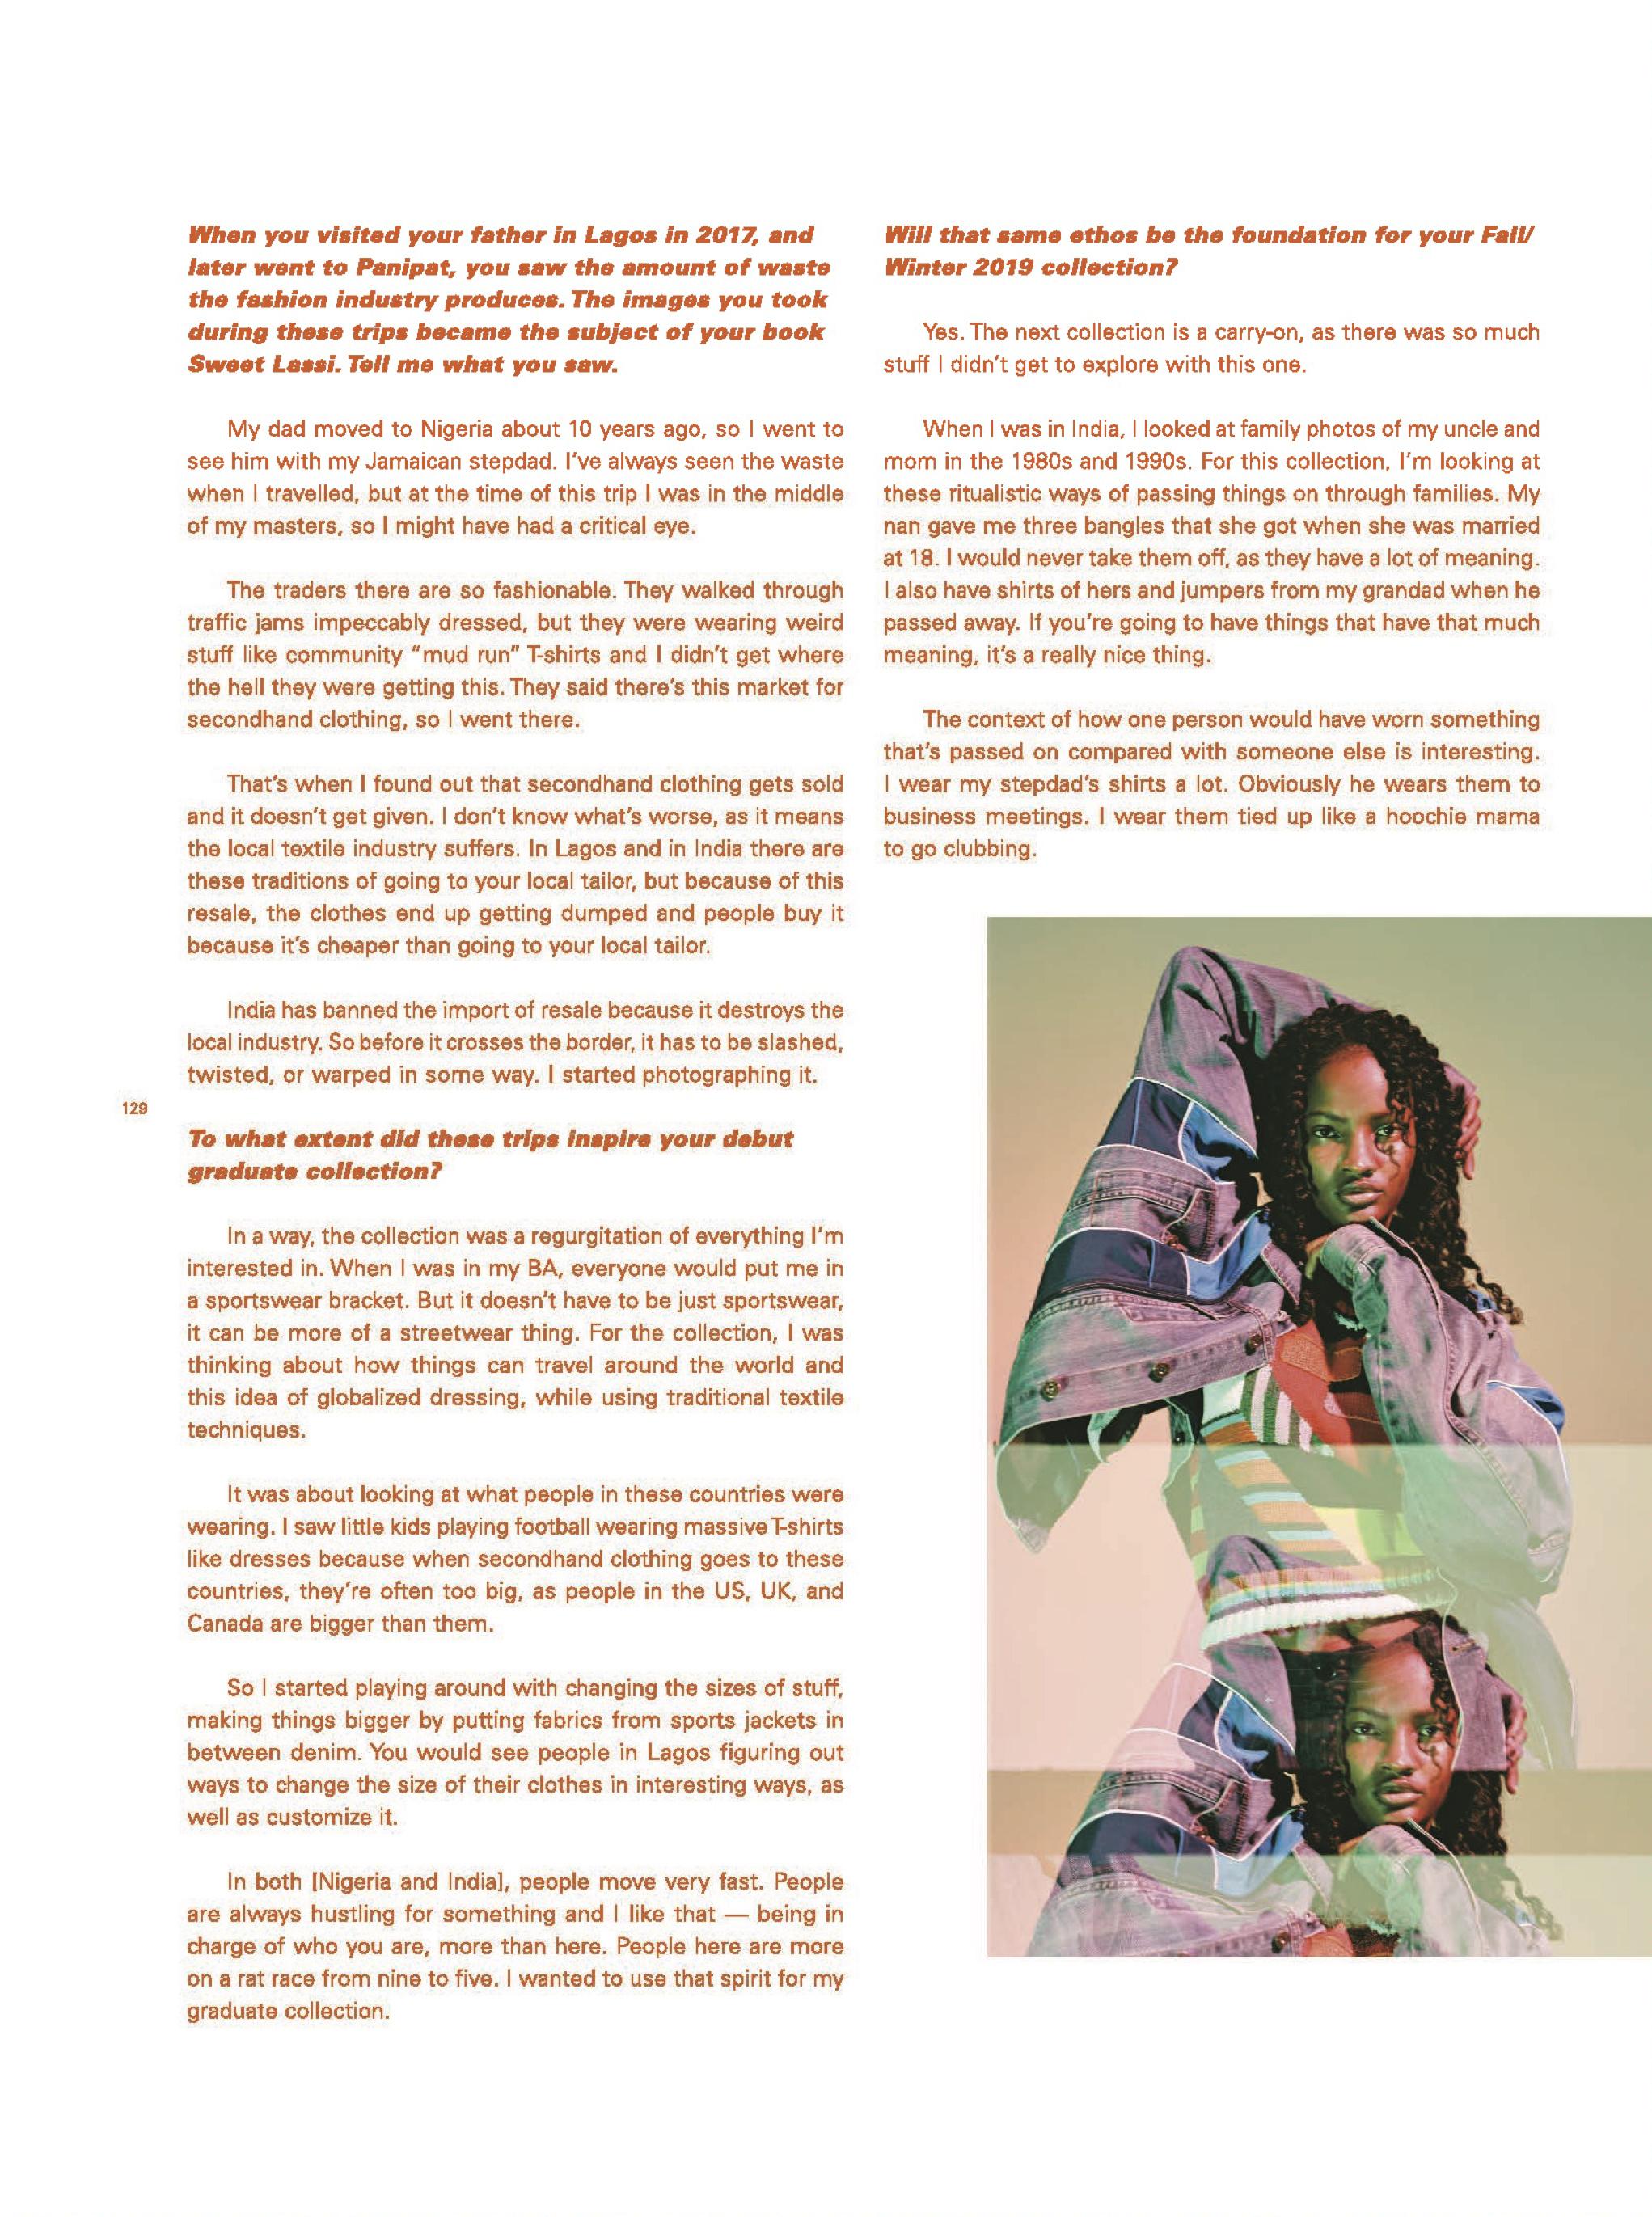 HGH SNOB PAGE 8 IMAGE.jpg